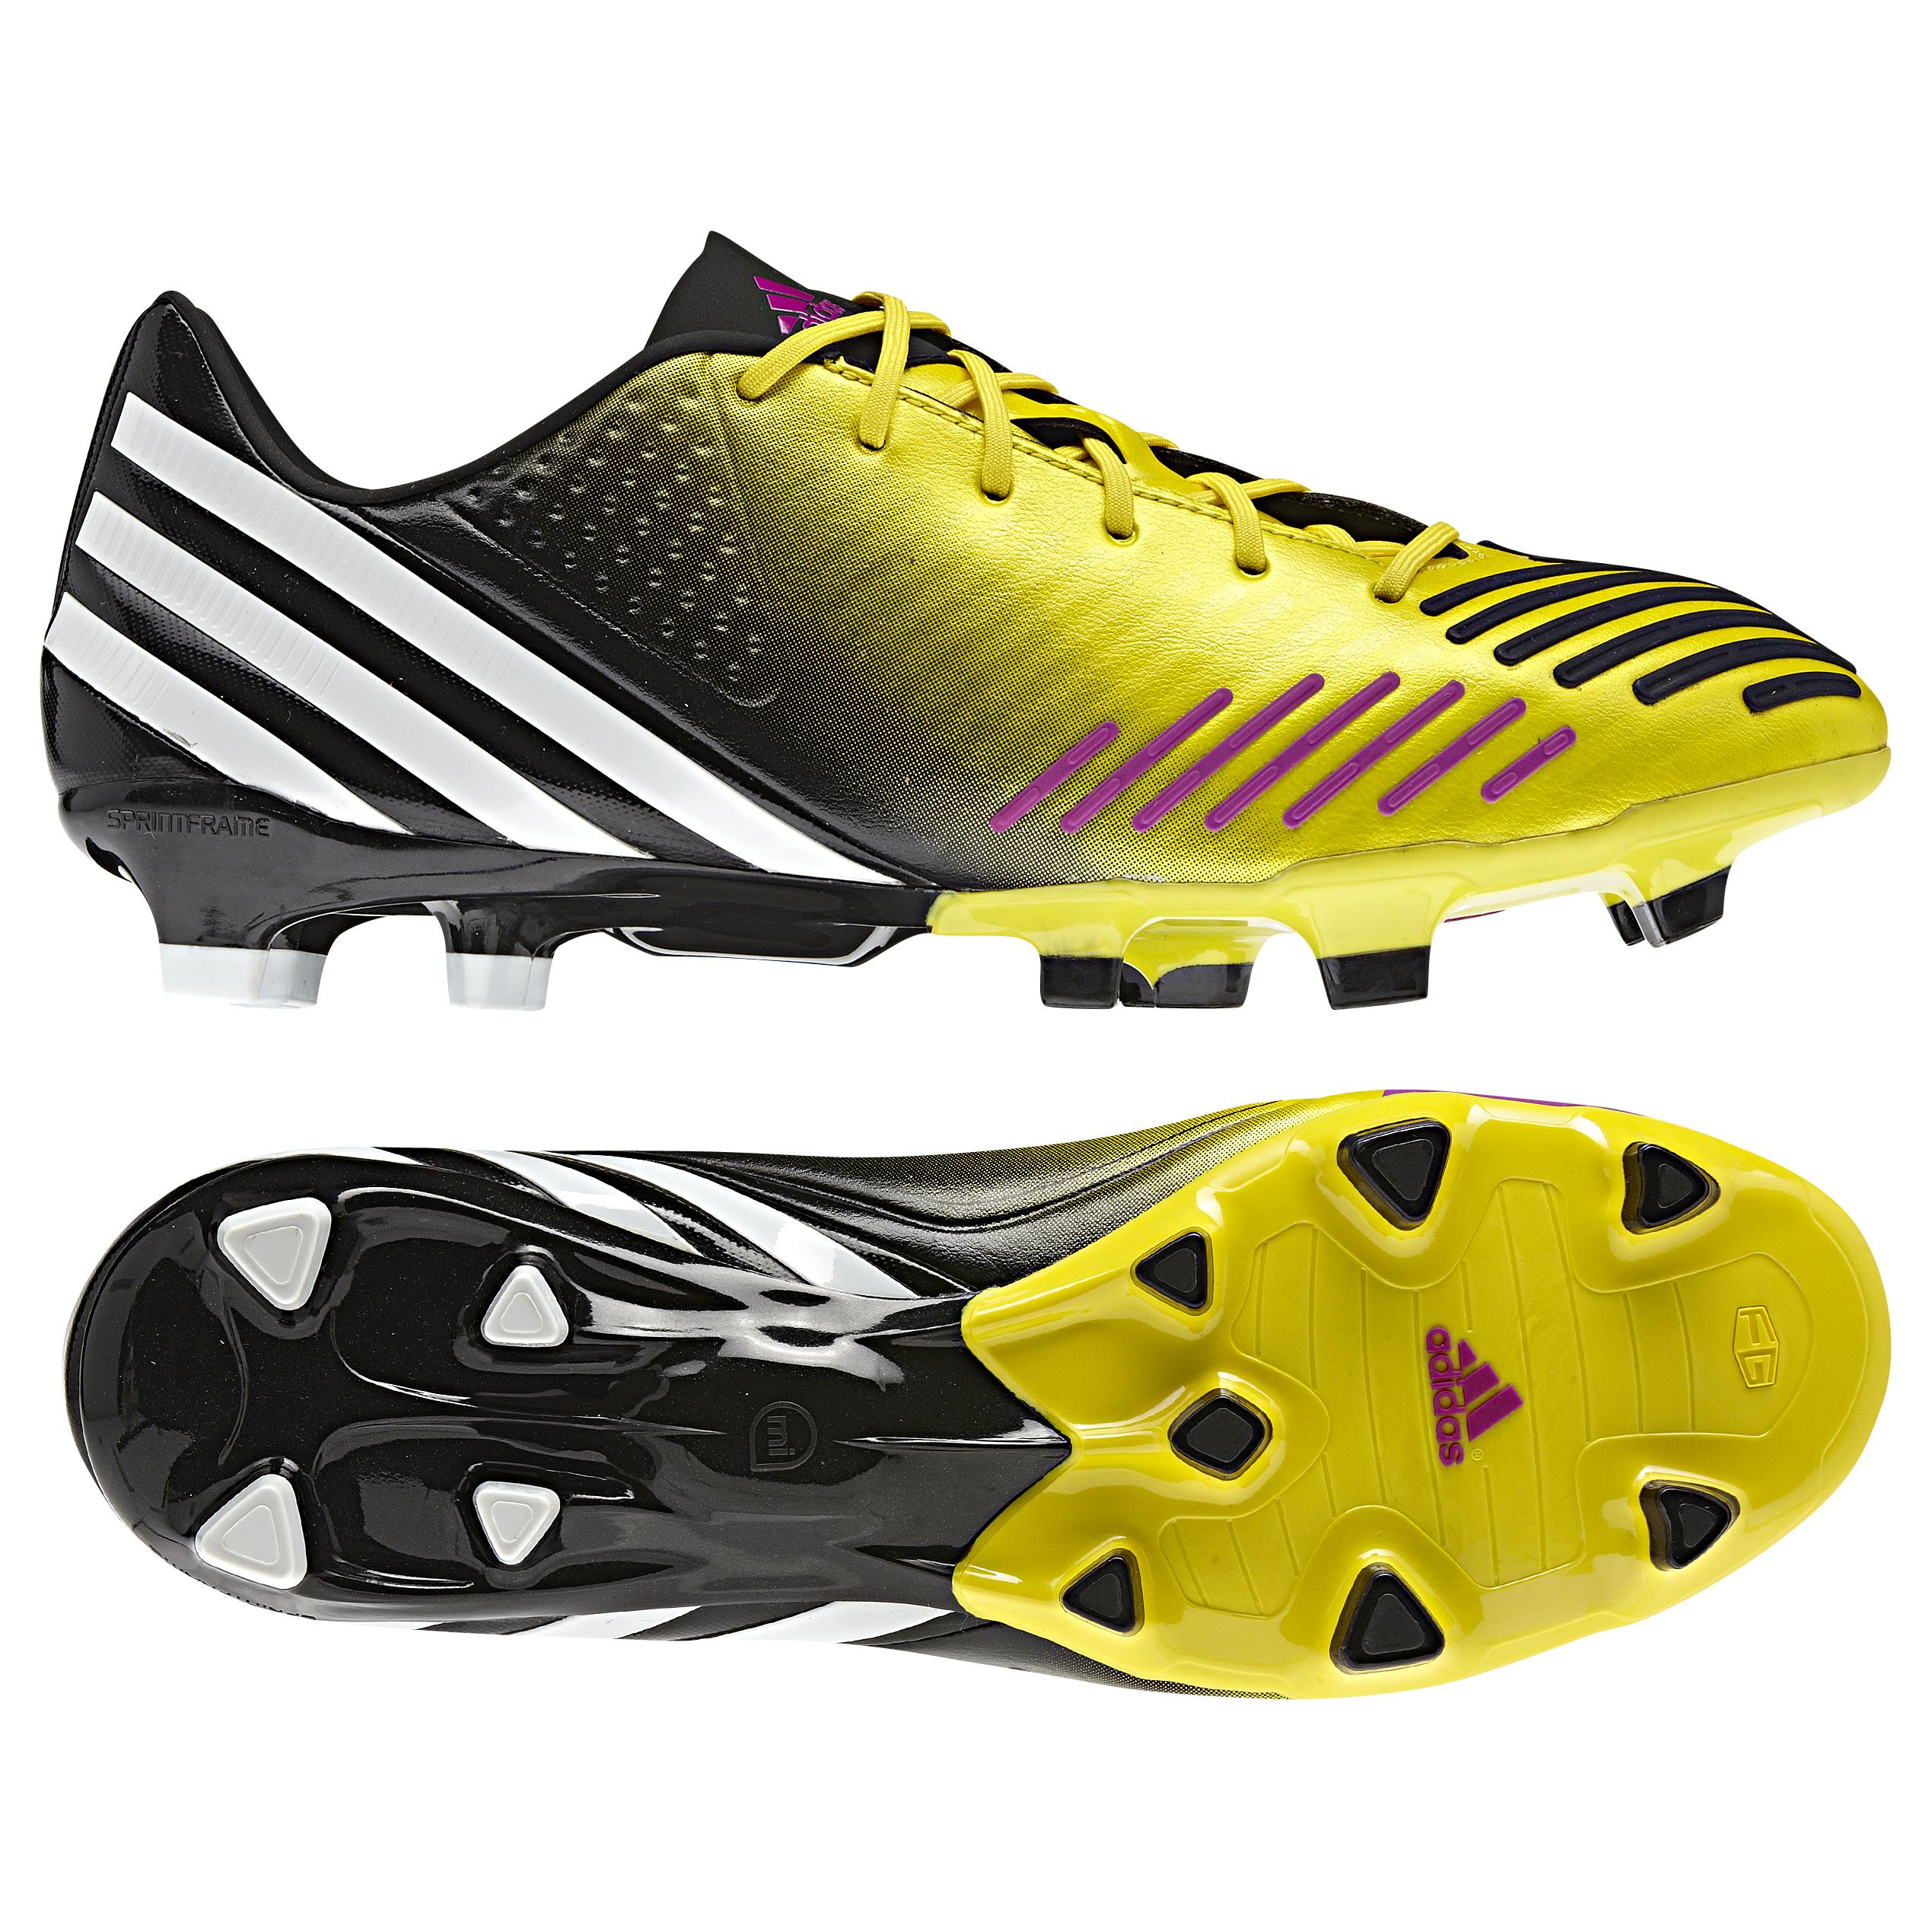 Predator LZ TRX FG Vivid Yellow/White/Vivid Pink